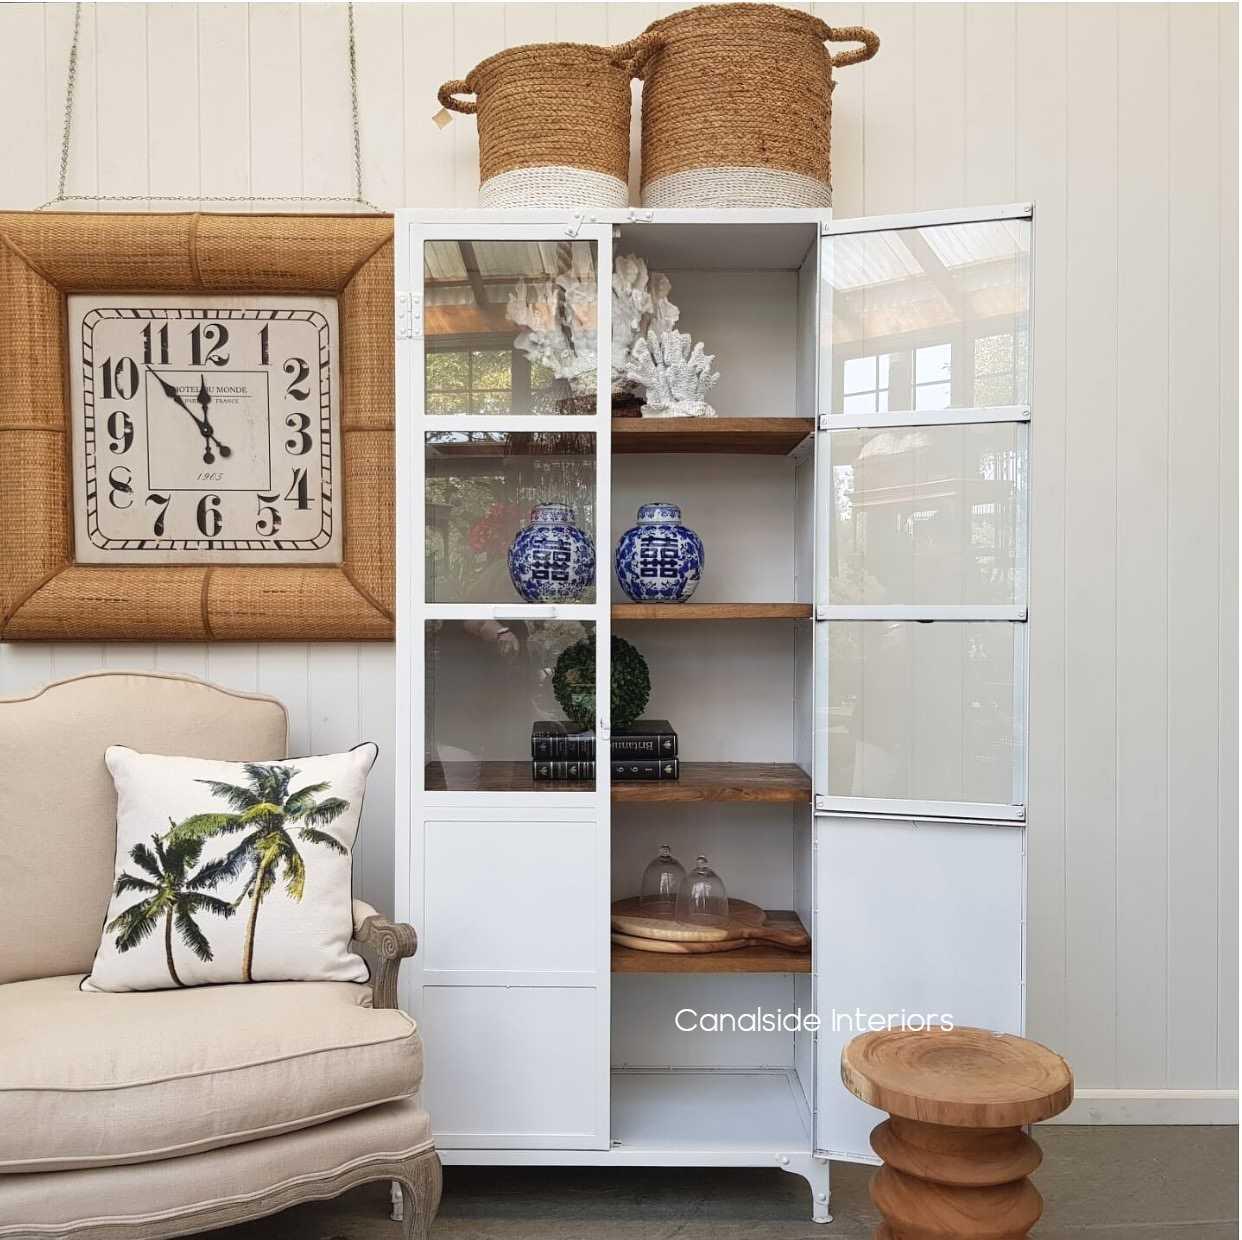 Foundry Almira 2 Door Metal Cupboard Distressed White  INDUSTRIAL RUSTIC Style, CAFE FURNITURE, LIVING Room, LIVING TV Media & Storage, LIVING Cupboards & Bookcases, CAFE FURNITURE Storage, STORAGE, STORAGE Bookshelves & Cupboards